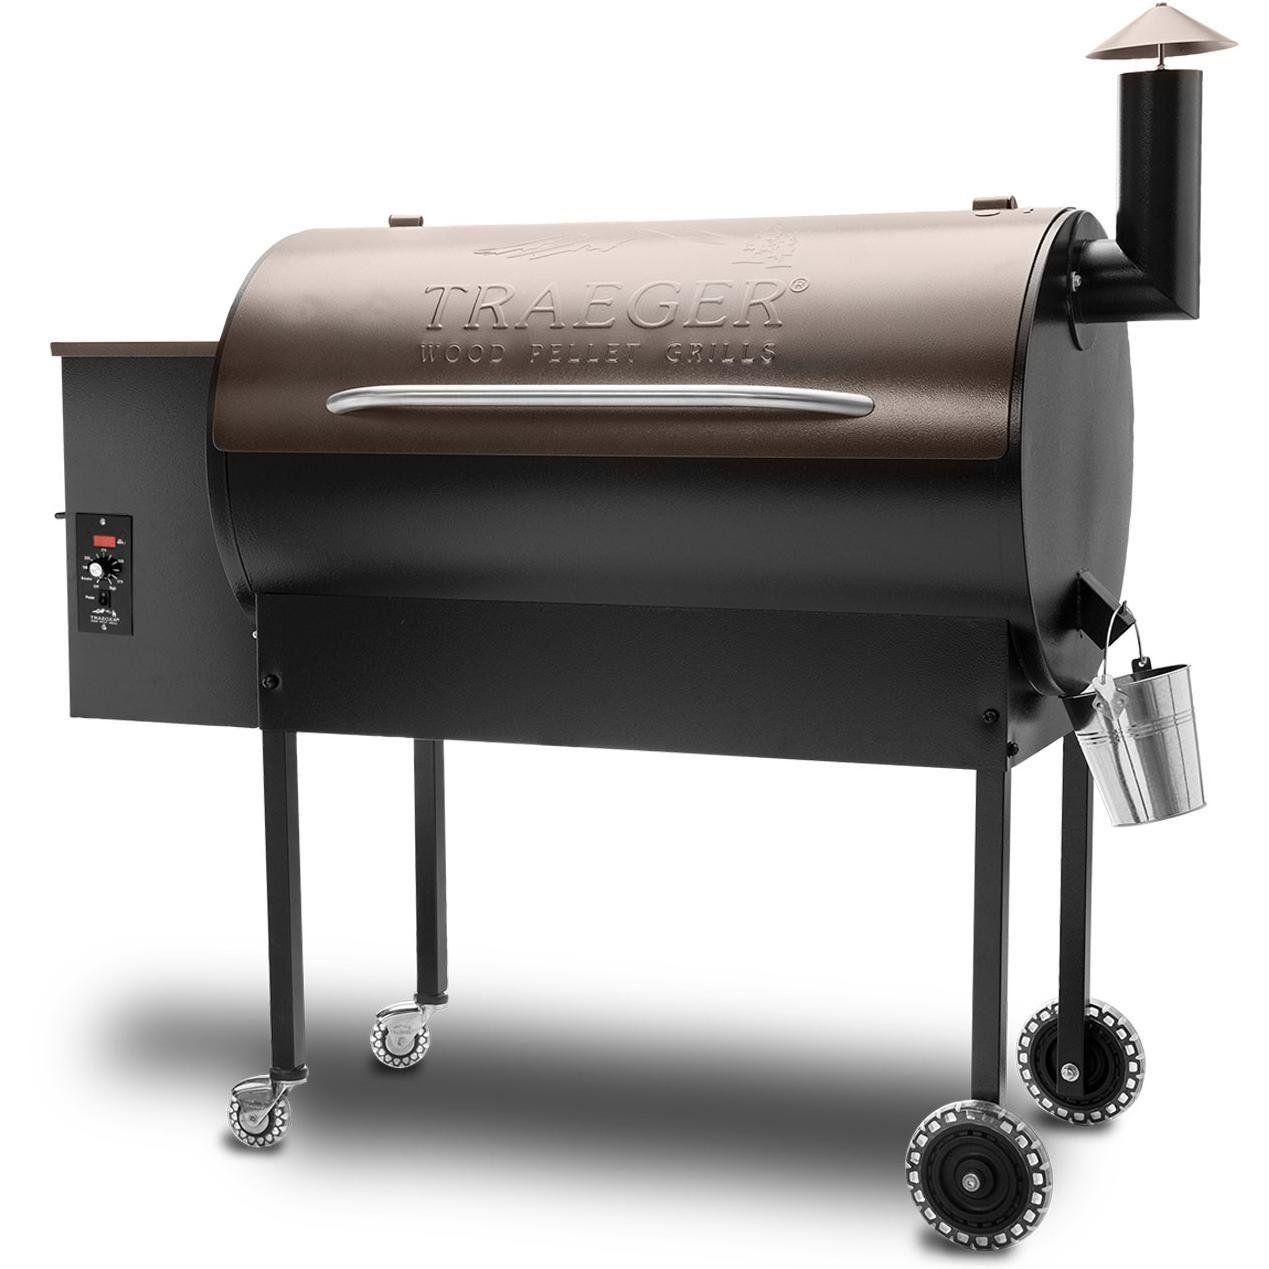 Traeger Texas Elite Pellet Grill On Cart - Bronze | Wish